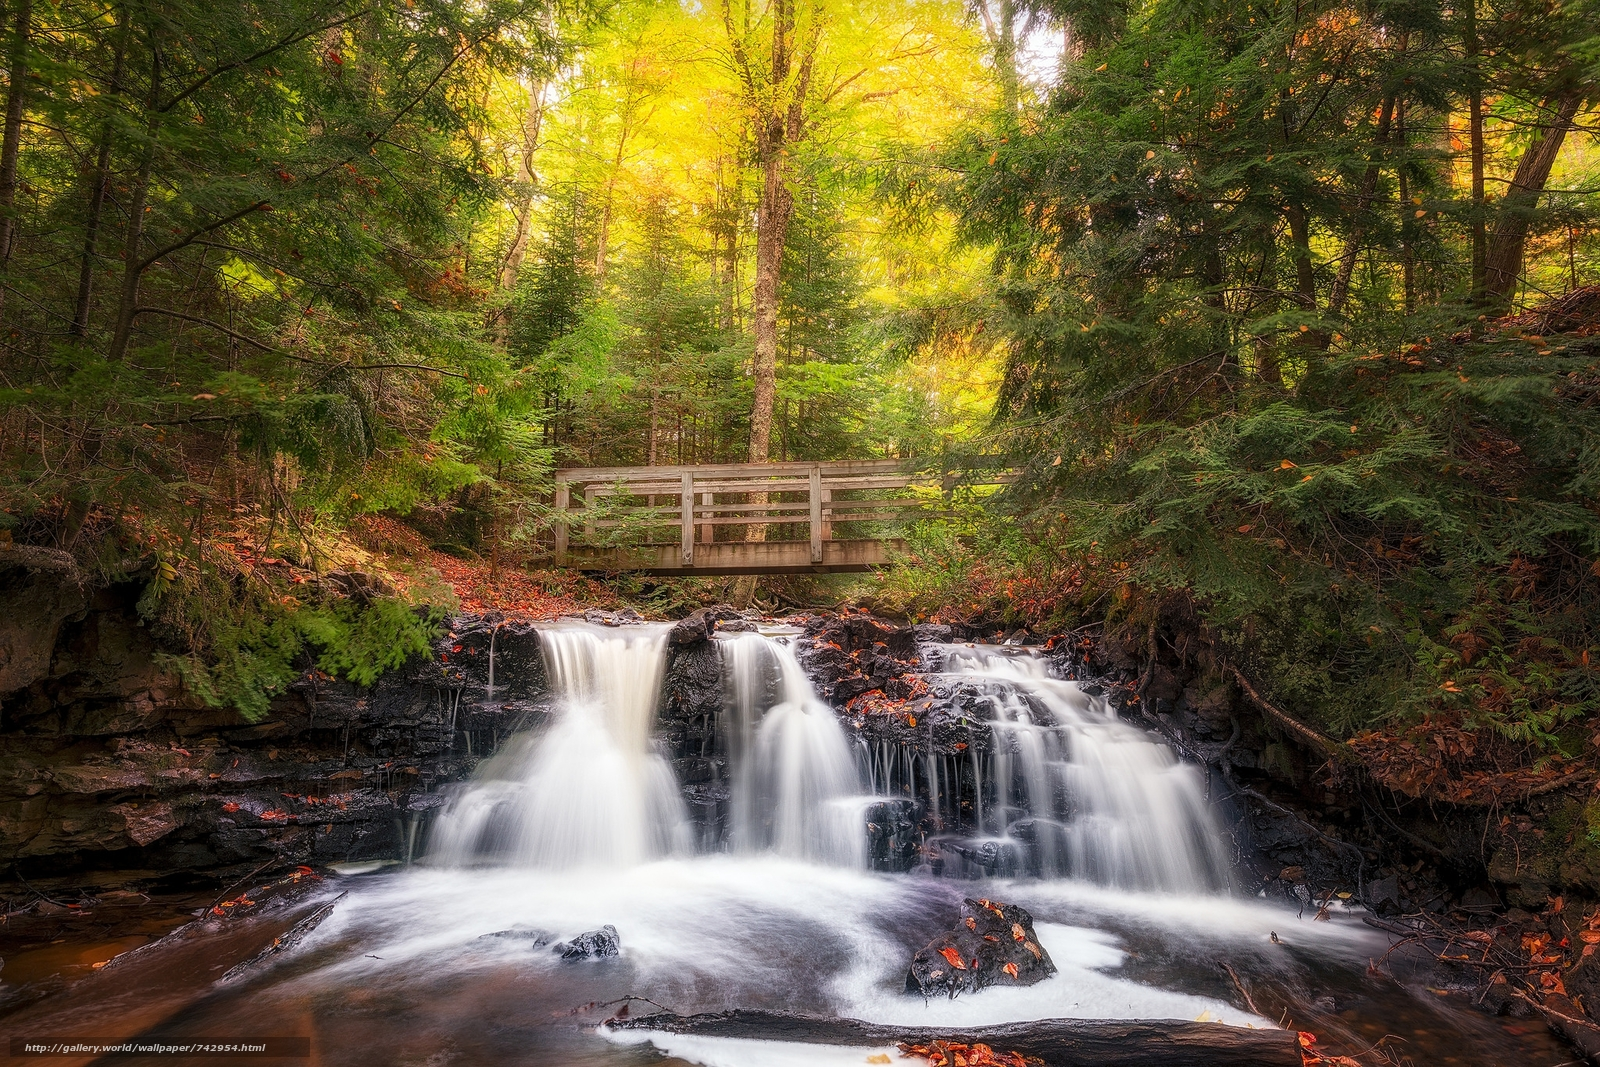 Upper Chapel Falls, Michigan, autumn, River, forest, bridge, waterfall, trees, landscape